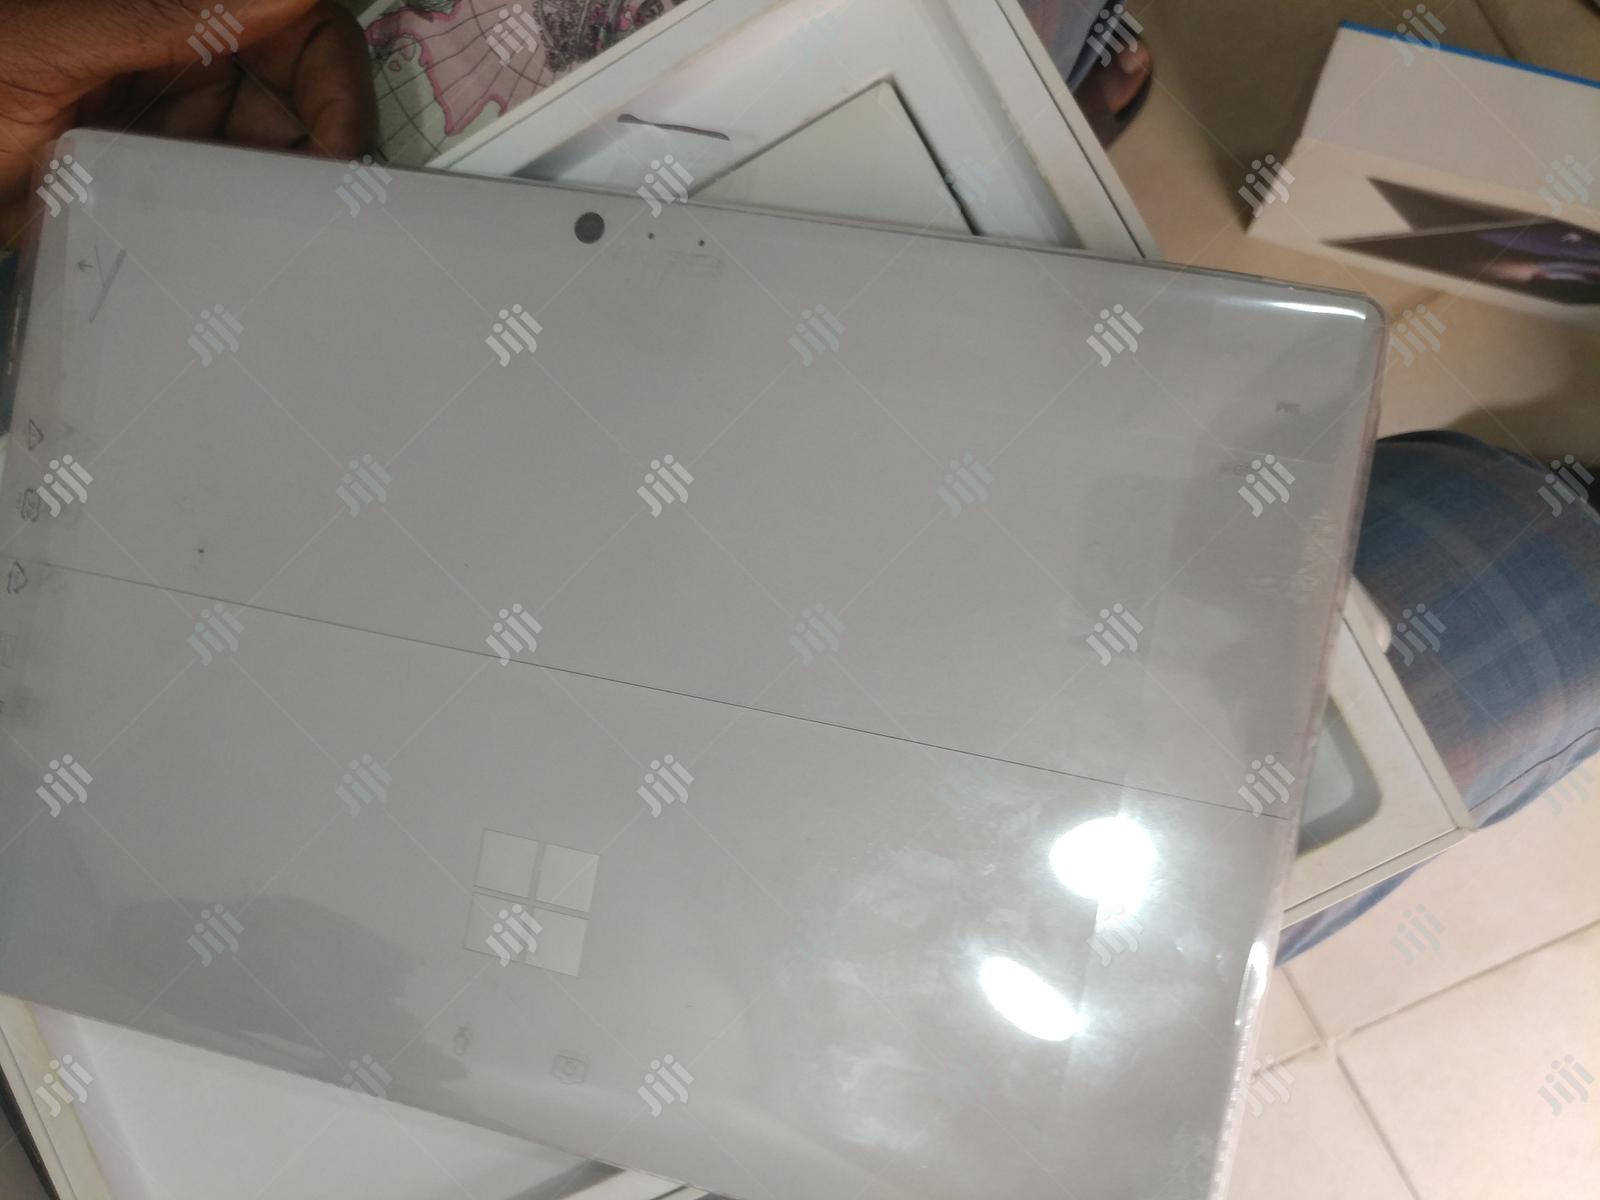 Laptop Microsoft Surface Pro 4 8GB Intel Core i5 HDD 256GB